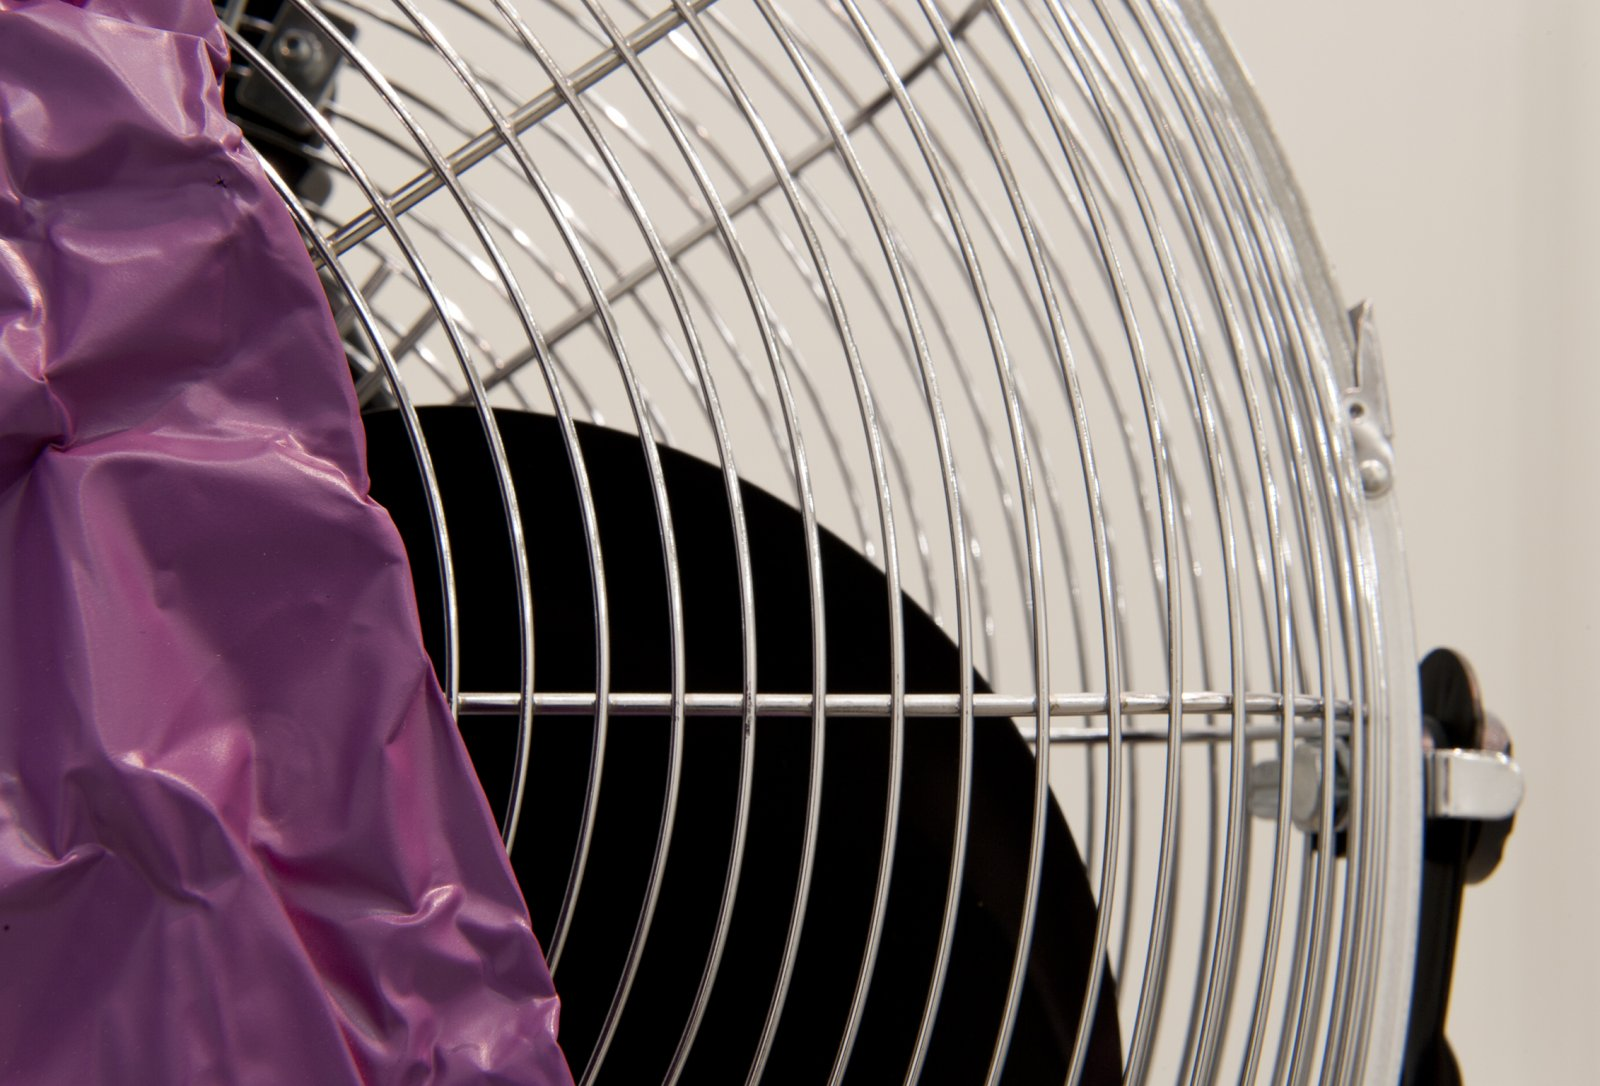 Judy Radul, Object Analysis Spectator Poem (Fan) (detail), 2012, painted copper, fan, colour photograph, 8 x 12 x 3 in. (20 x 29 x 8 cm), fan: 59 x 23 x 18 in. (150 x 58 x 46 cm), photo: 8 x 12 x 3 in. (20 x 29 x 8 cm) by Judy Radul